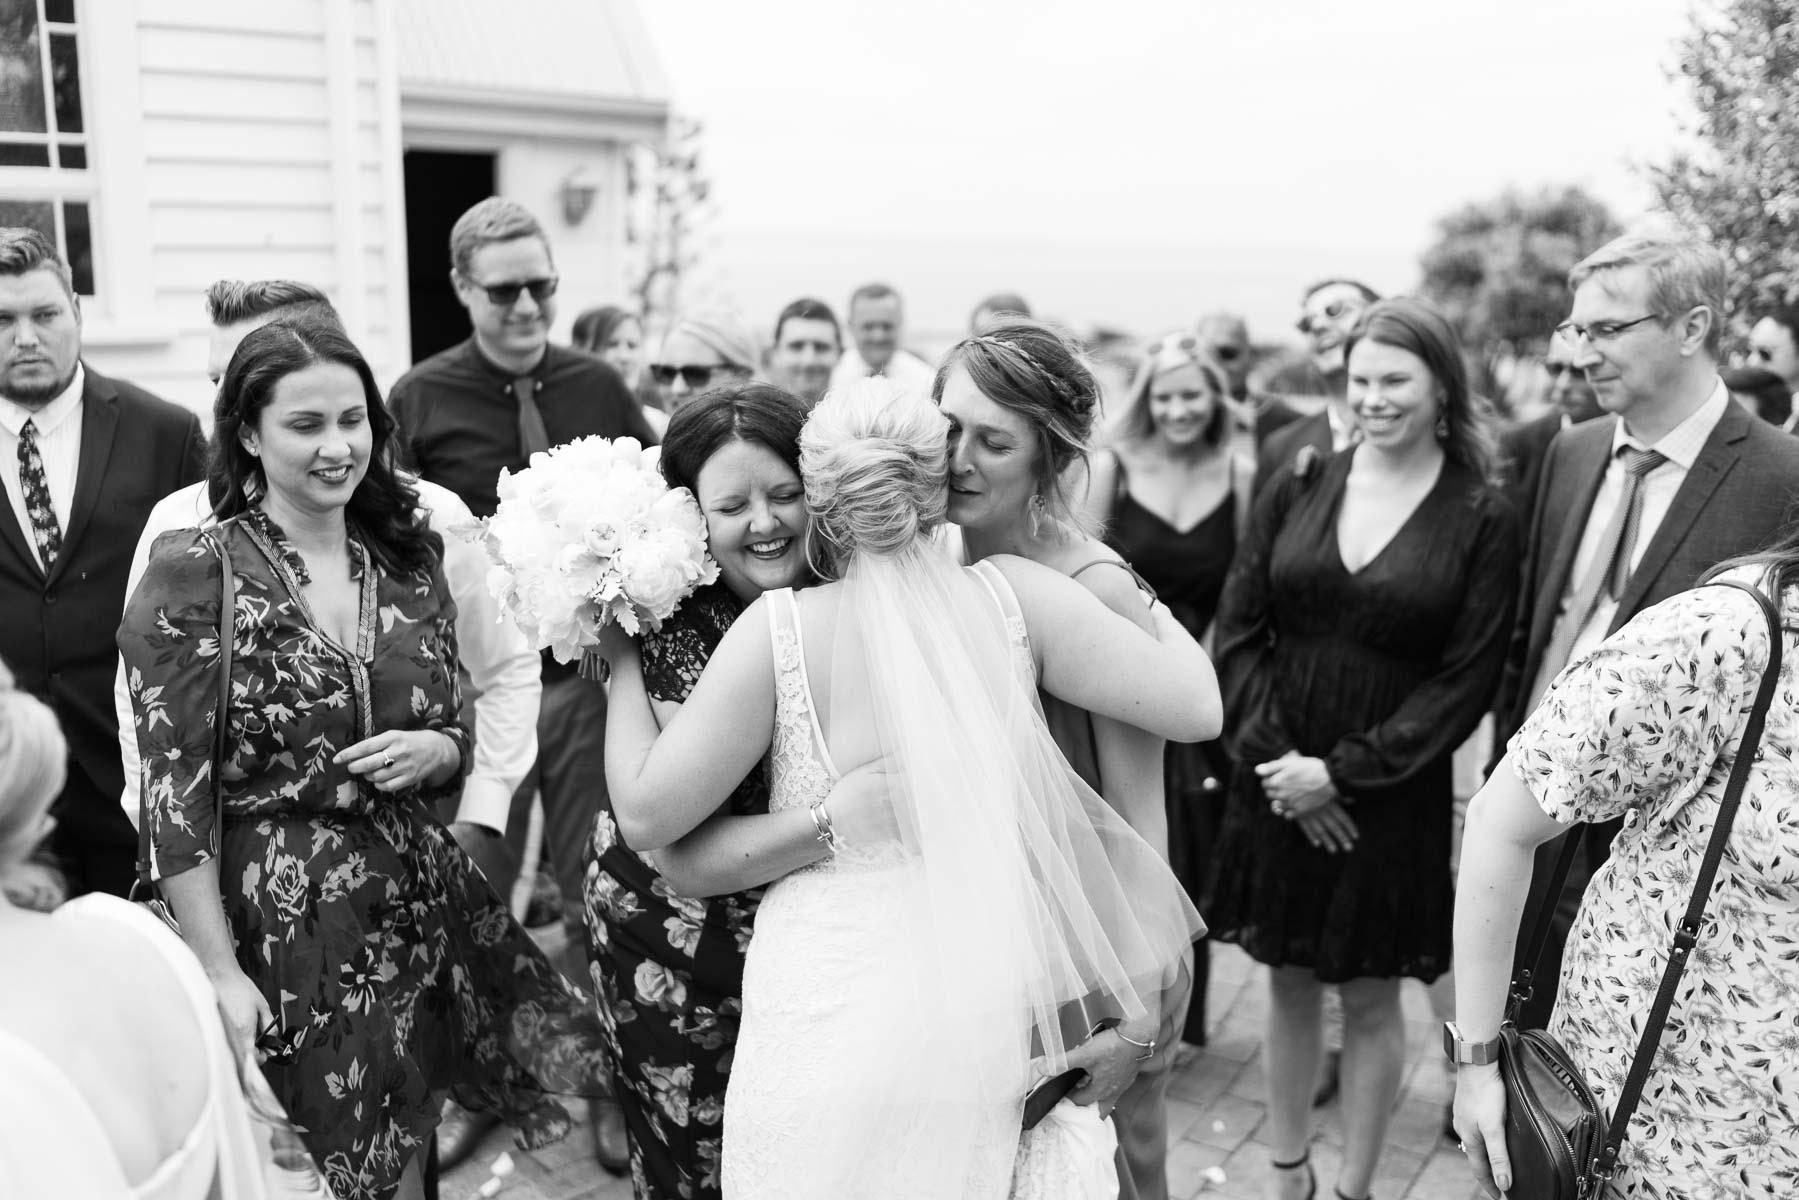 trenavin-chapel-phillip-island-wedding-heart+soul-weddings-sally-sean-00432.jpg